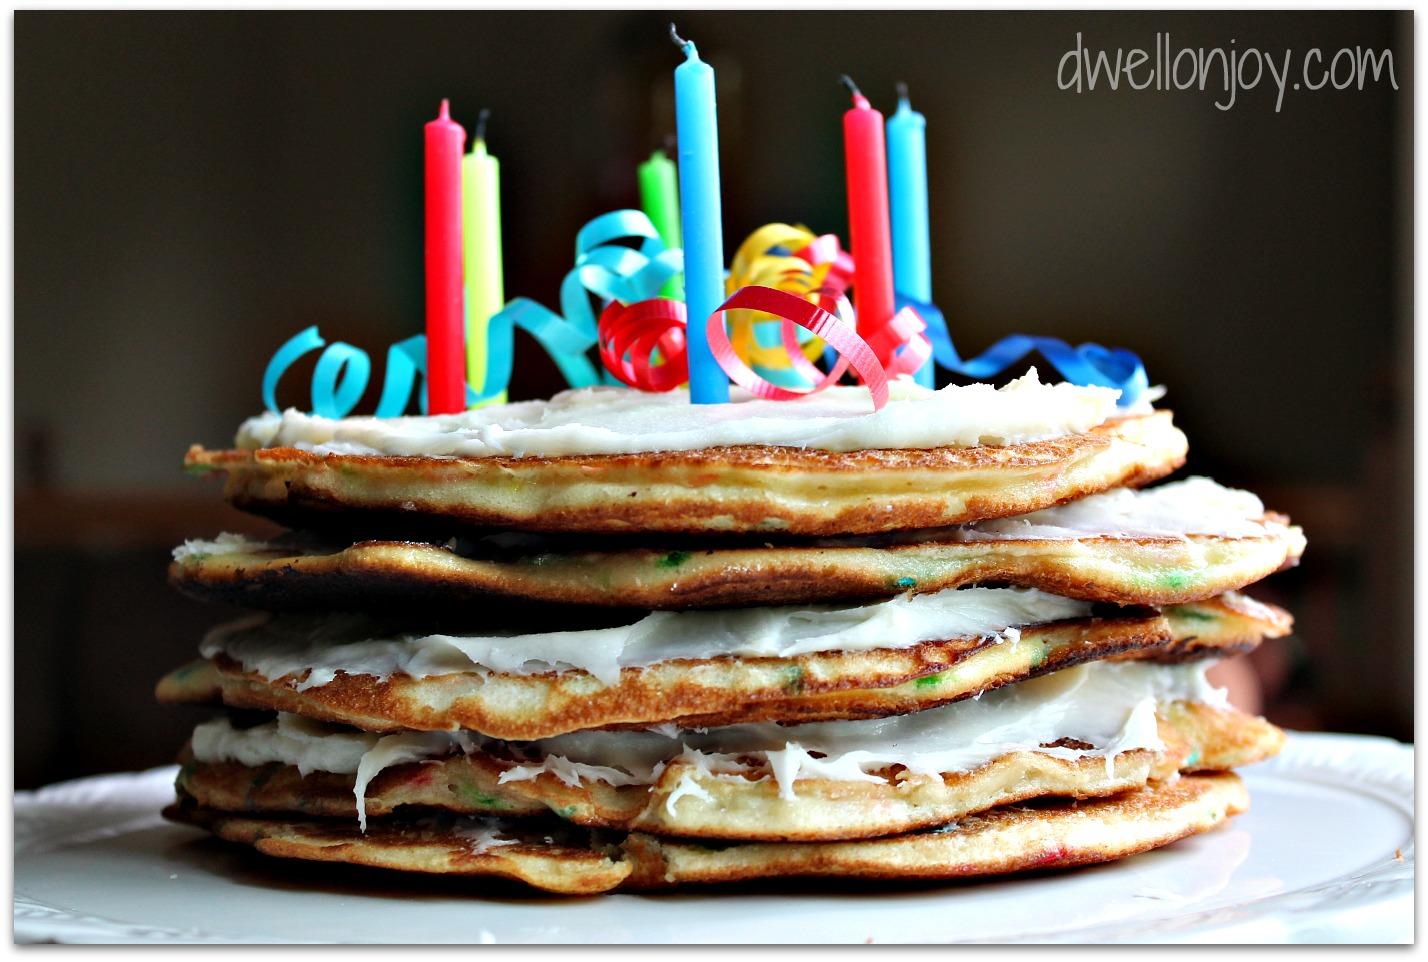 Birthday Pan Cake Dwell On Joy